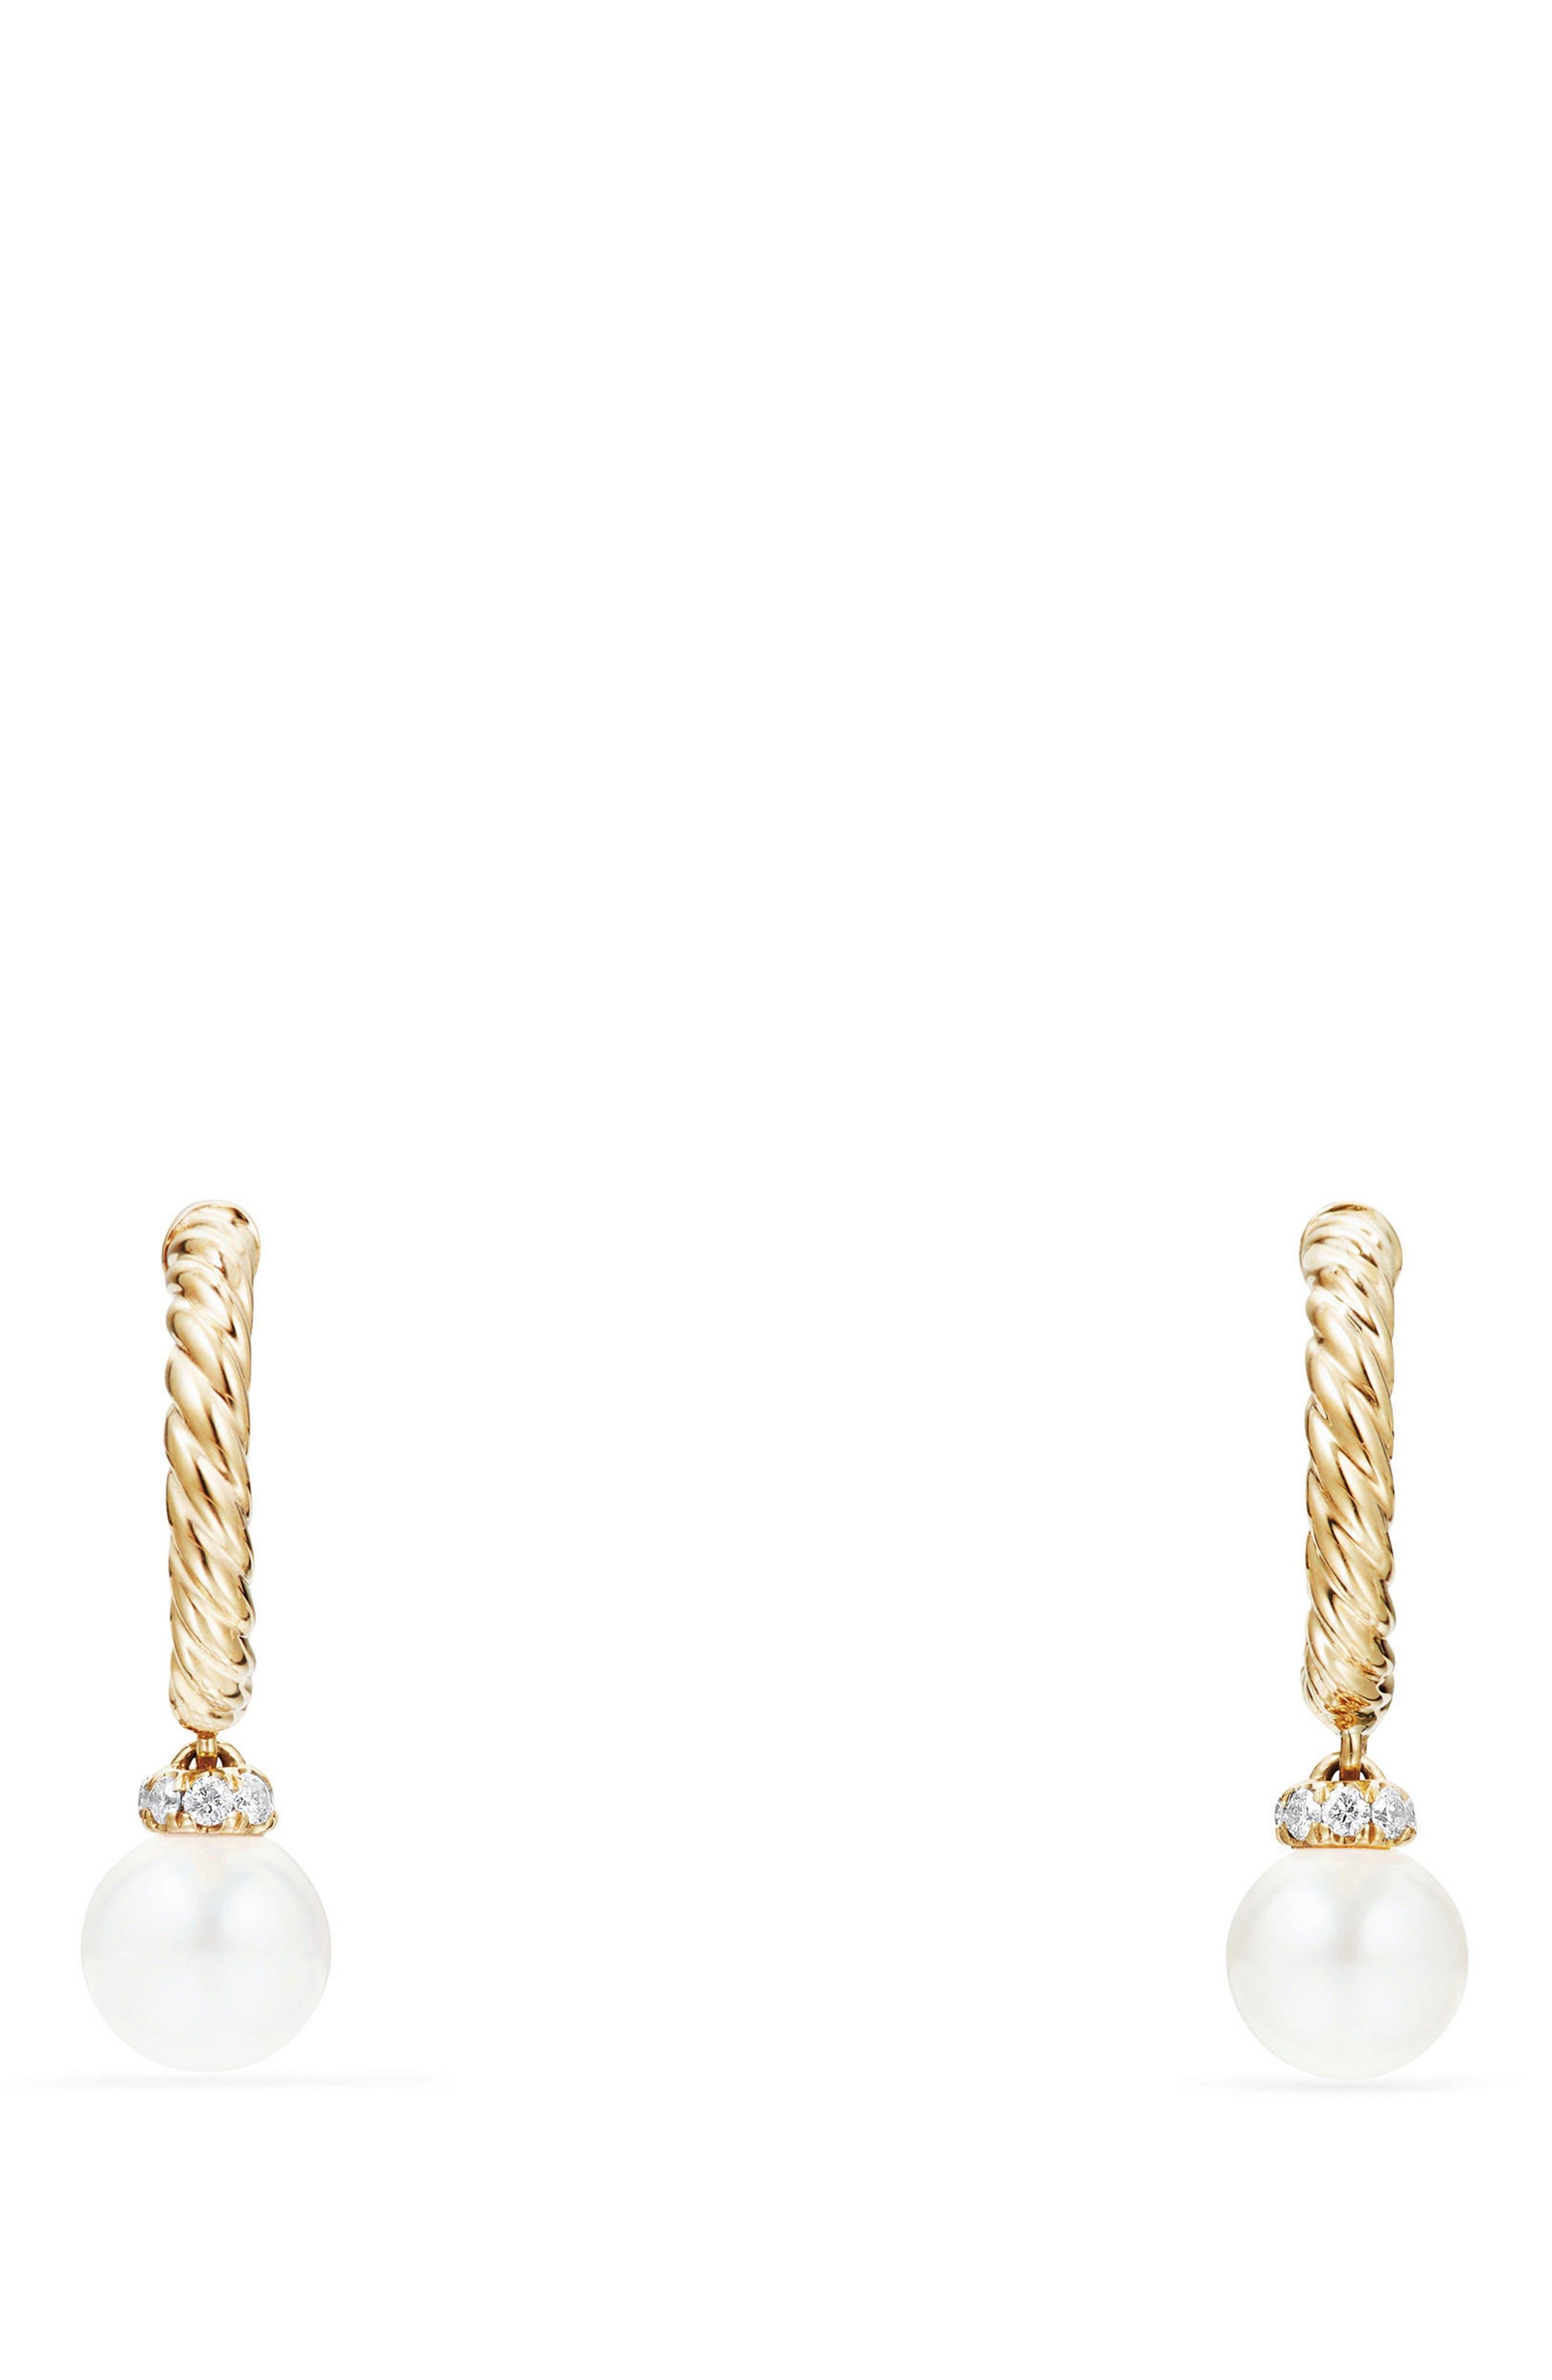 Solari Hoop Earrings with Diamonds & Pearls in 18K Gold,                             Alternate thumbnail 2, color,                             YELLOW GOLD/ DIAMOND/ PEARL